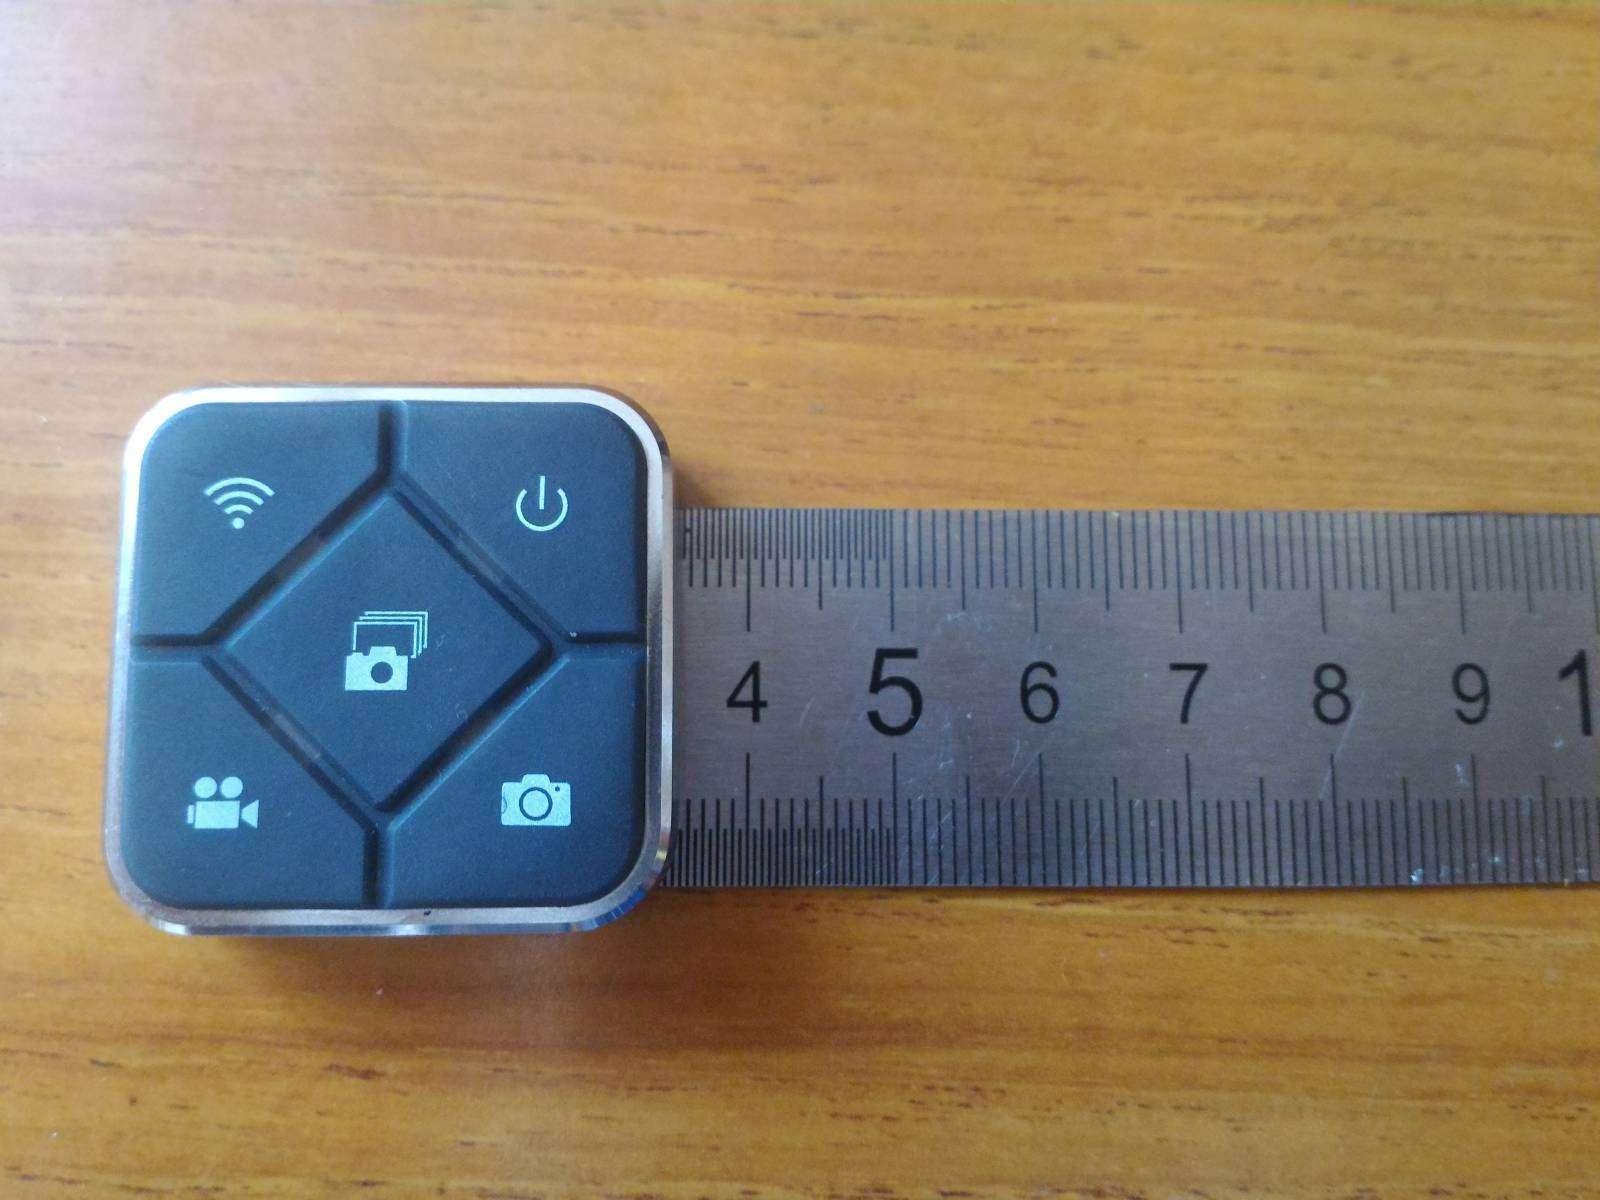 GearBest: Беспроводной контроллер для камеры Sjcam M20